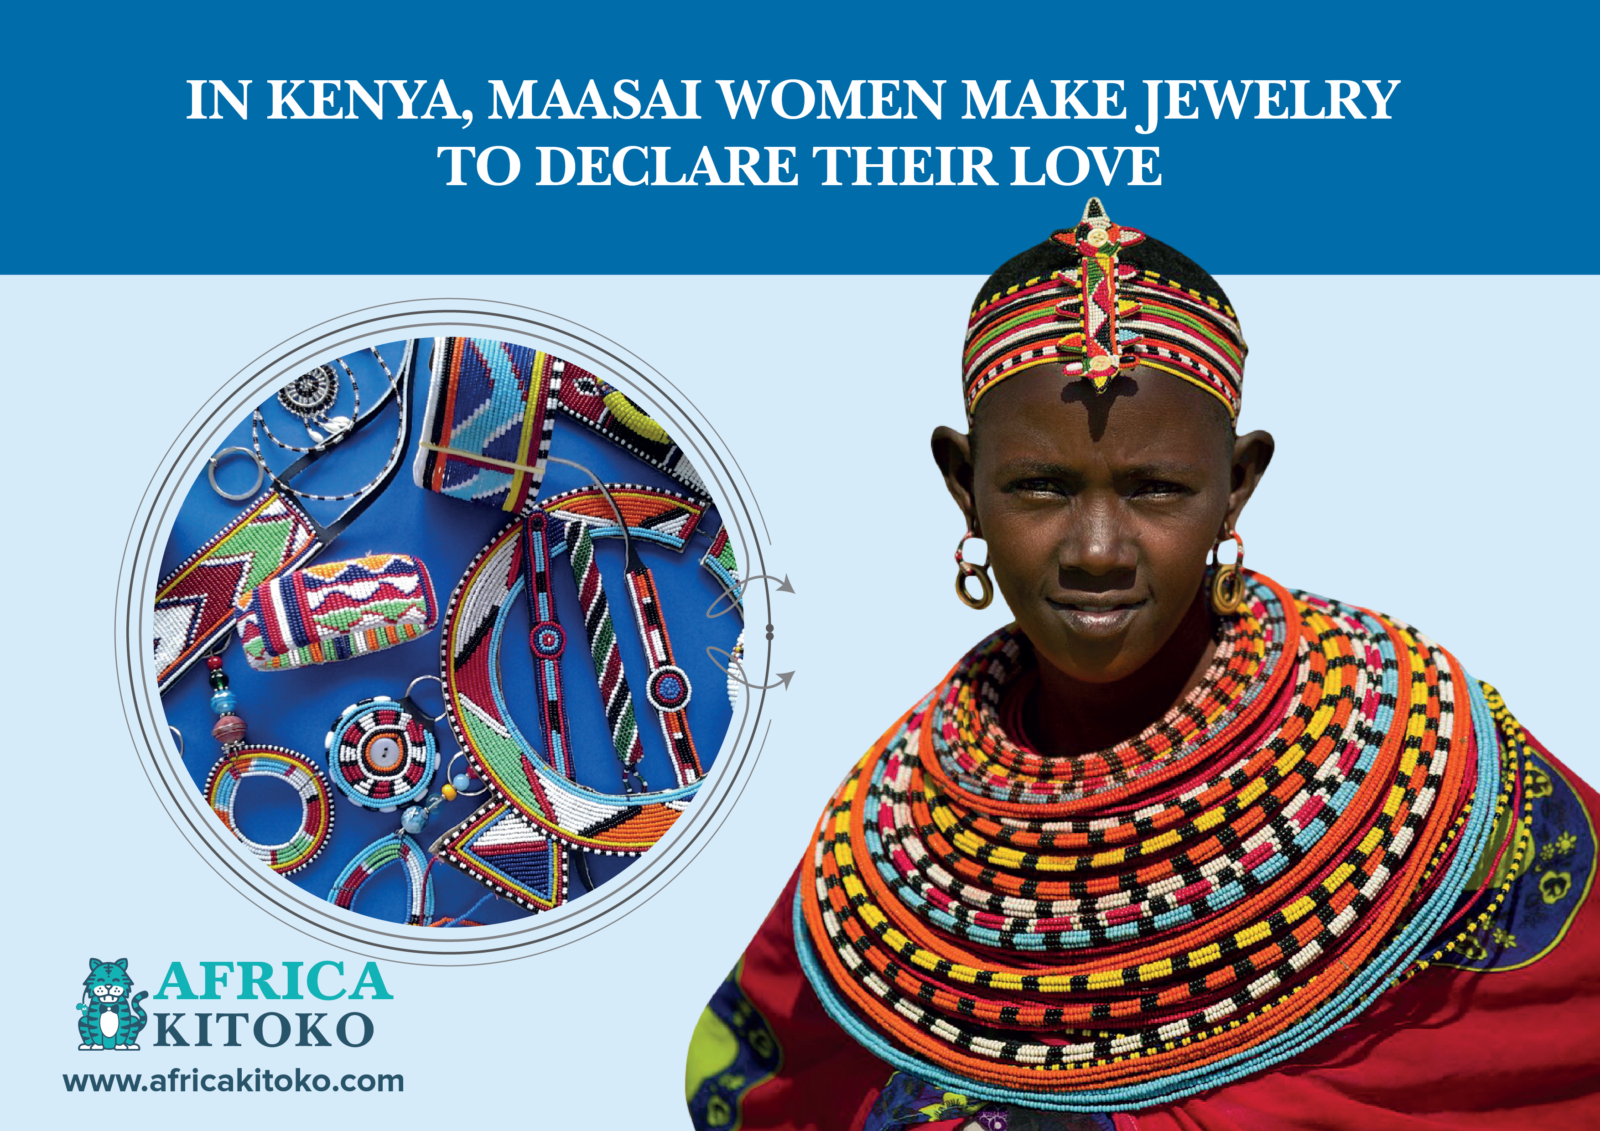 1000+ images about FGM & women marginalisation on